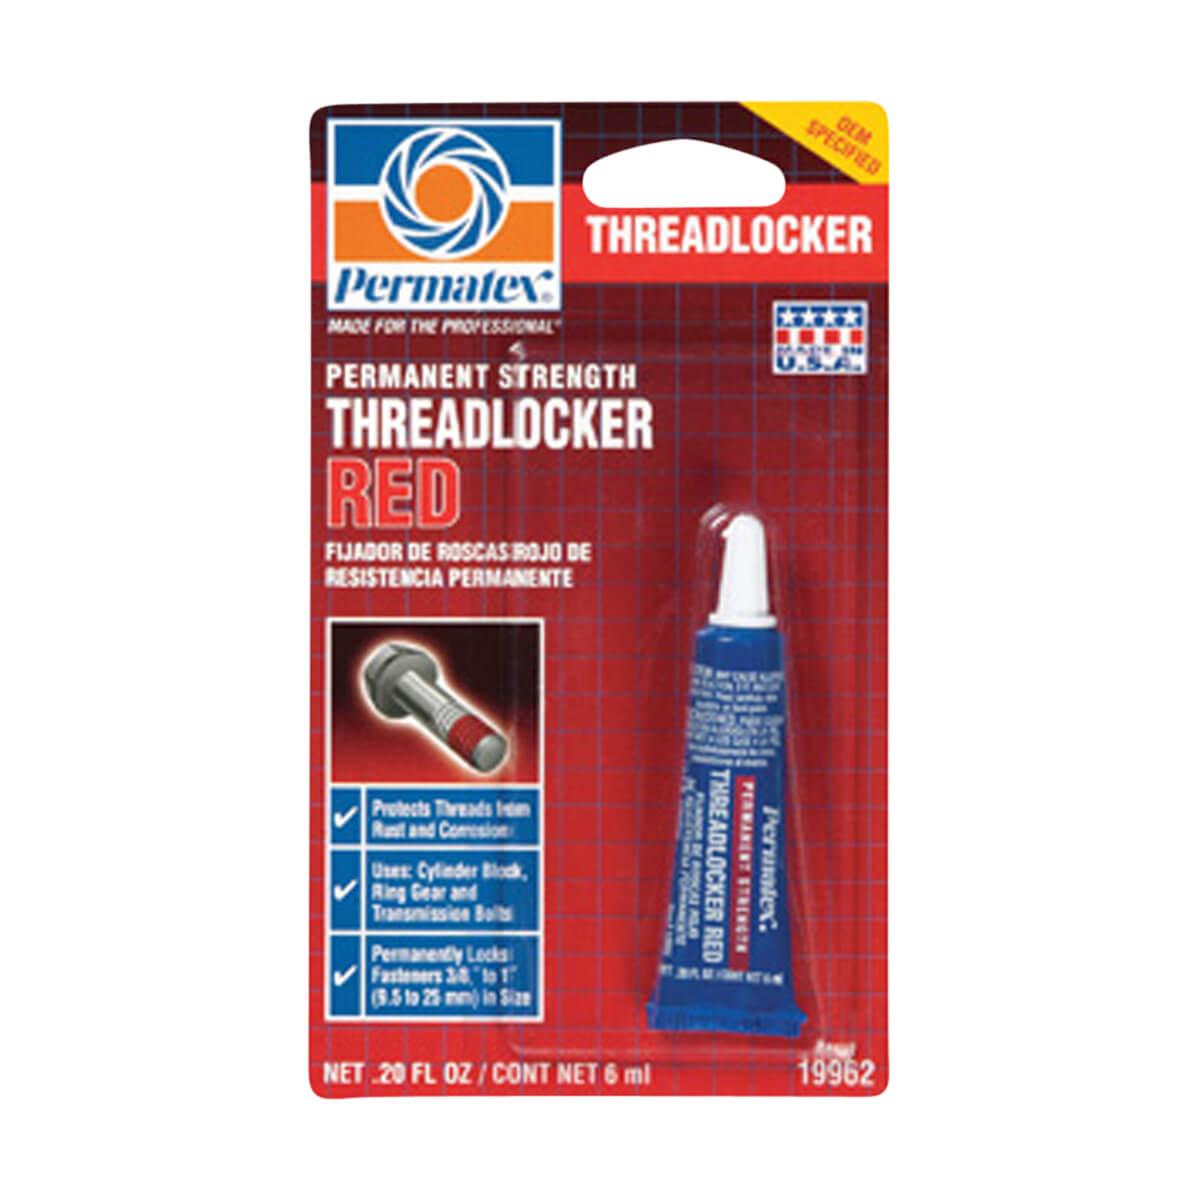 Permatex® /manent Strength Threadlocker RED - 6 mL